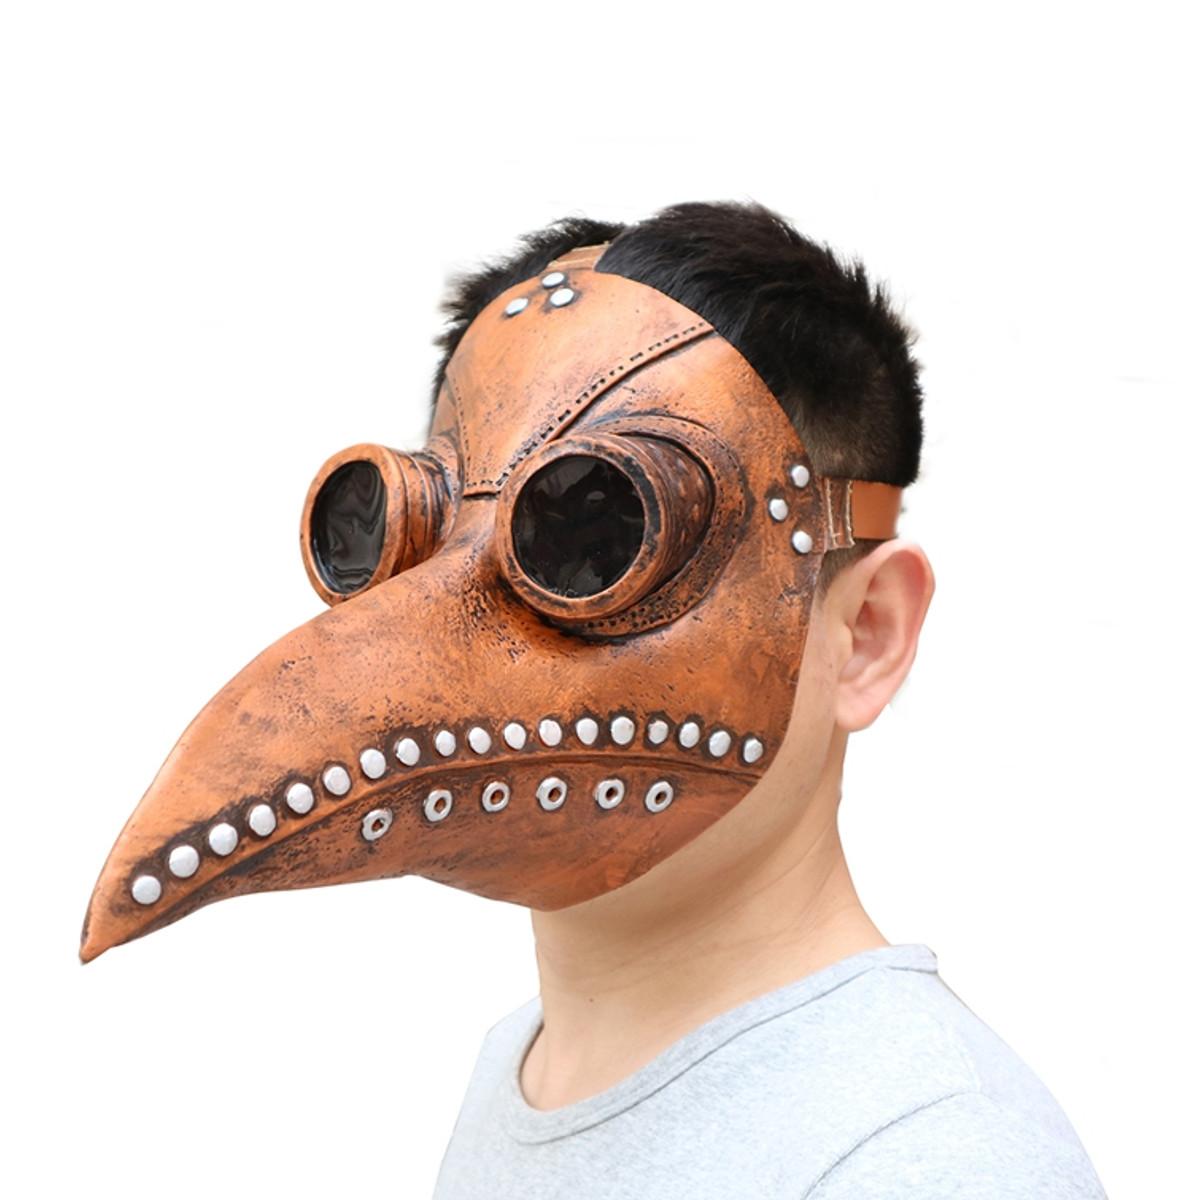 Хэллоуин косплей стимпанк чума доктор Маска птица клюв реквизит ретр готика Маскаs - фото 3a5fcfbc-8f6b-45fa-8e3c-c0d4c164be8e.jpg